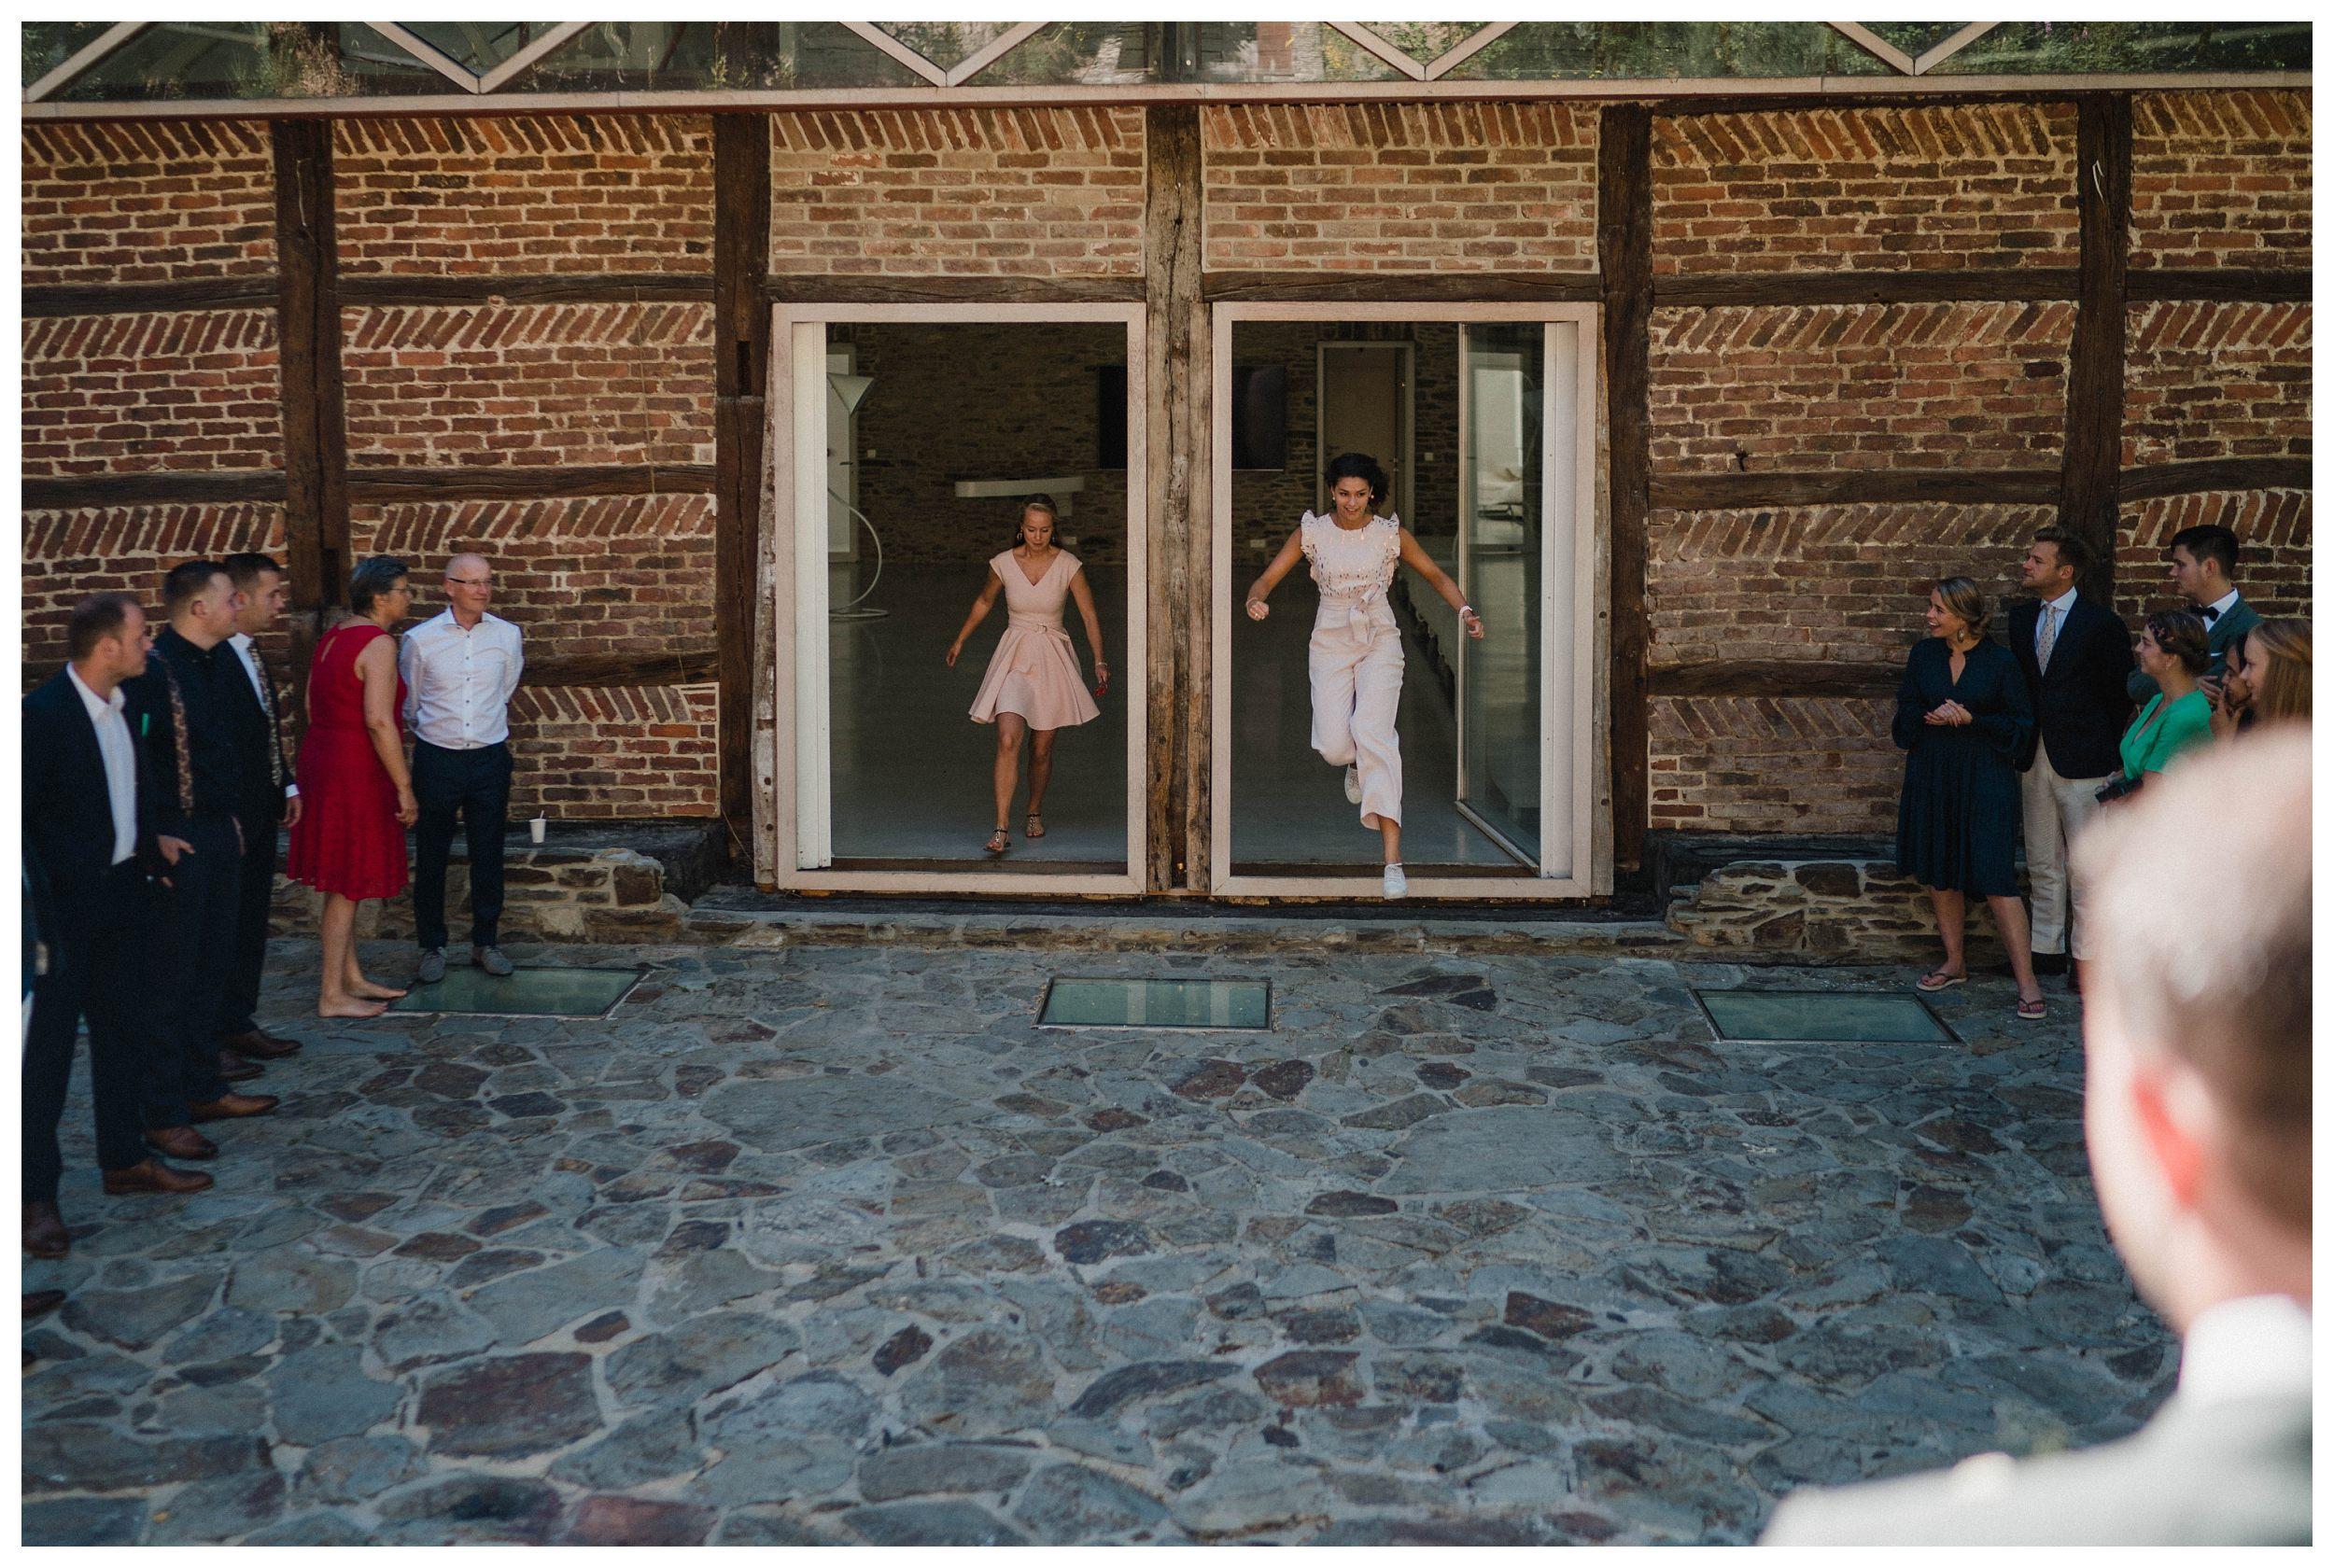 huwelijksfotograaf bruidsfotograaf destinationwedding huwelijksfotografie in ardennen nederland (21).jpg